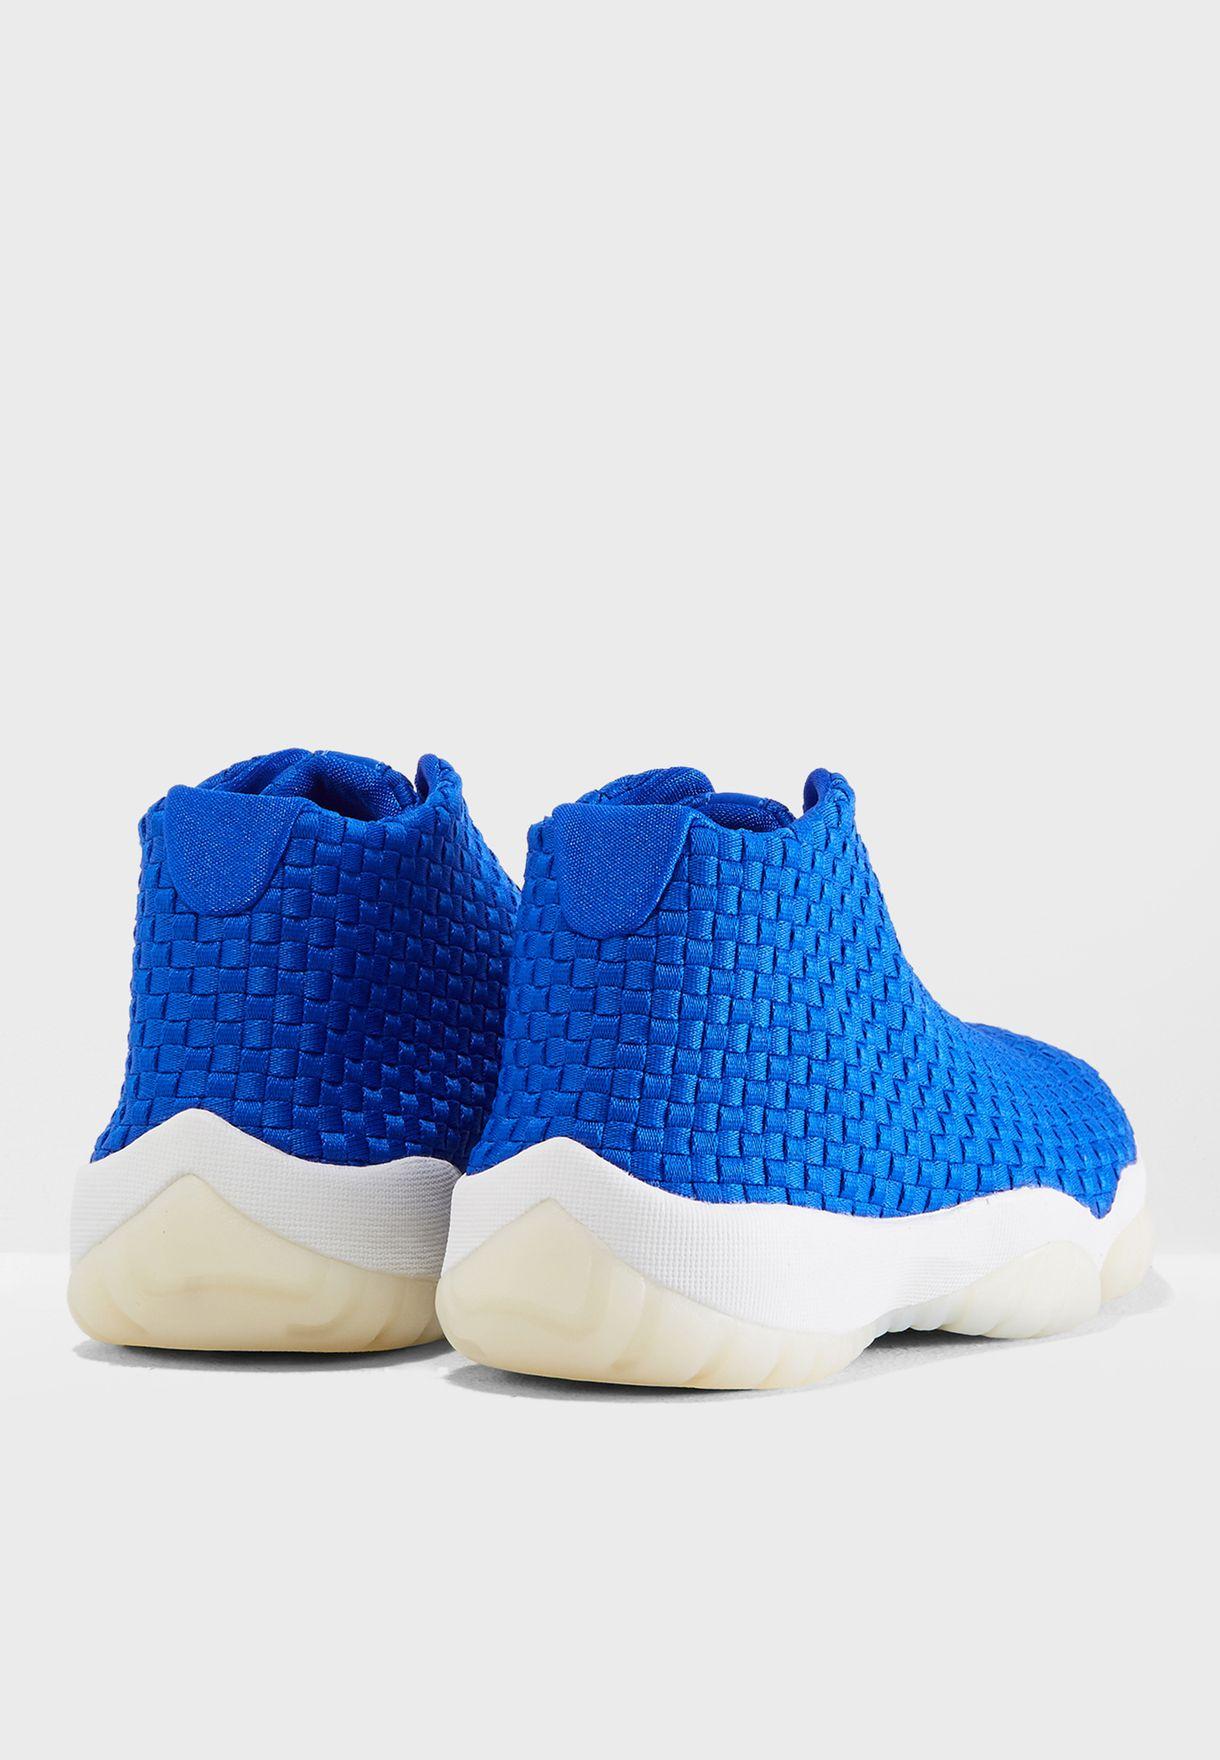 580f5083da0f Shop Nike blue Air Jordan Future 656503-402 for Men in Kuwait ...